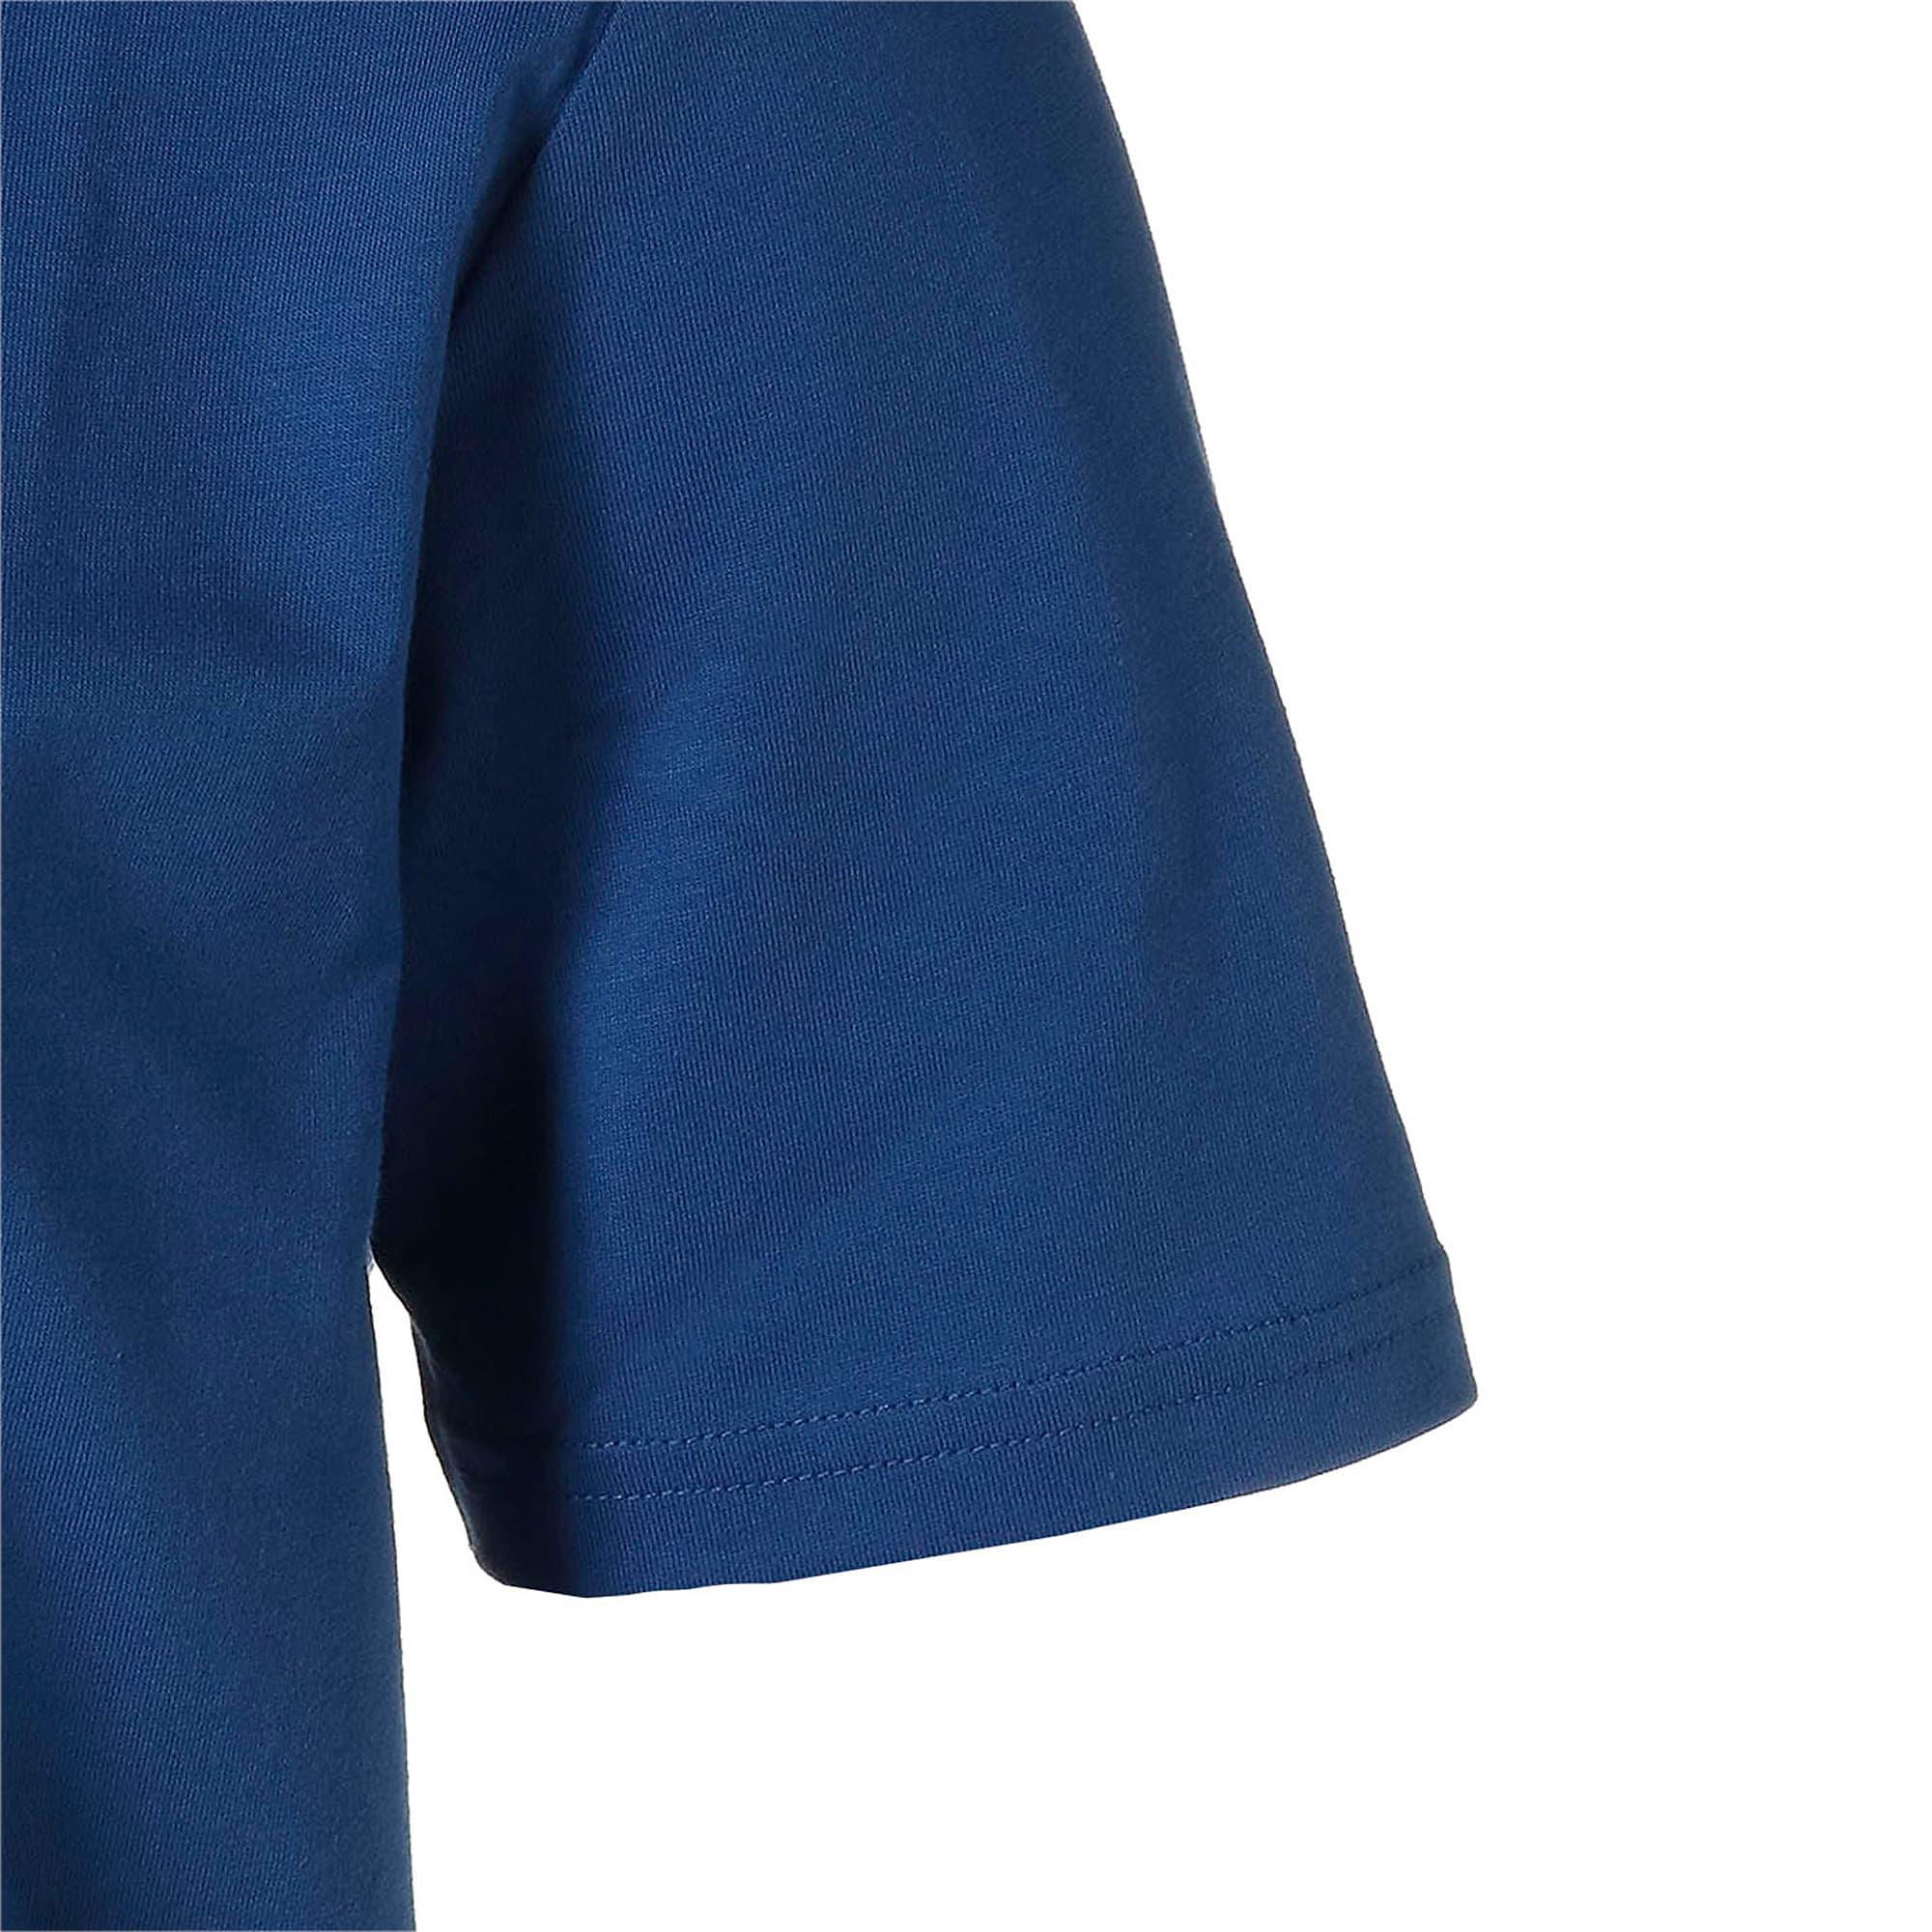 Thumbnail 8 of PUMA x LES BENJAMINS Tシャツ, Galaxy Blue, medium-JPN